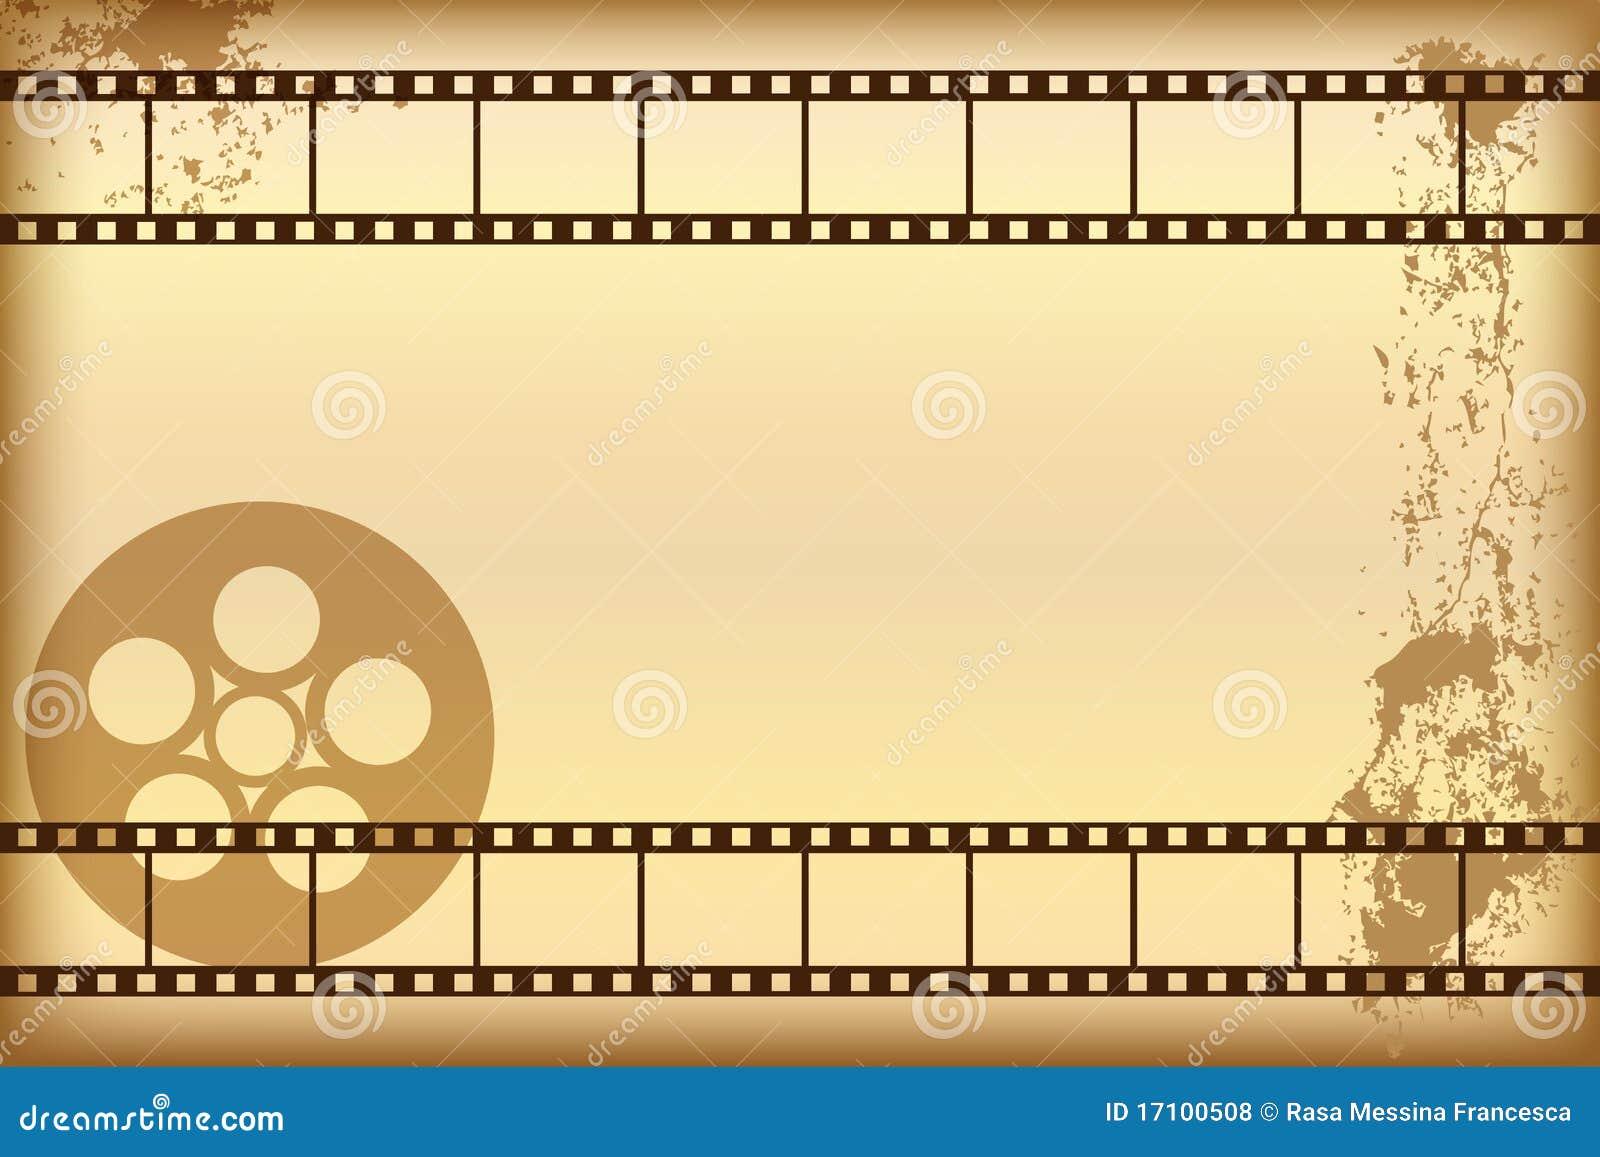 free movie night flyer templates